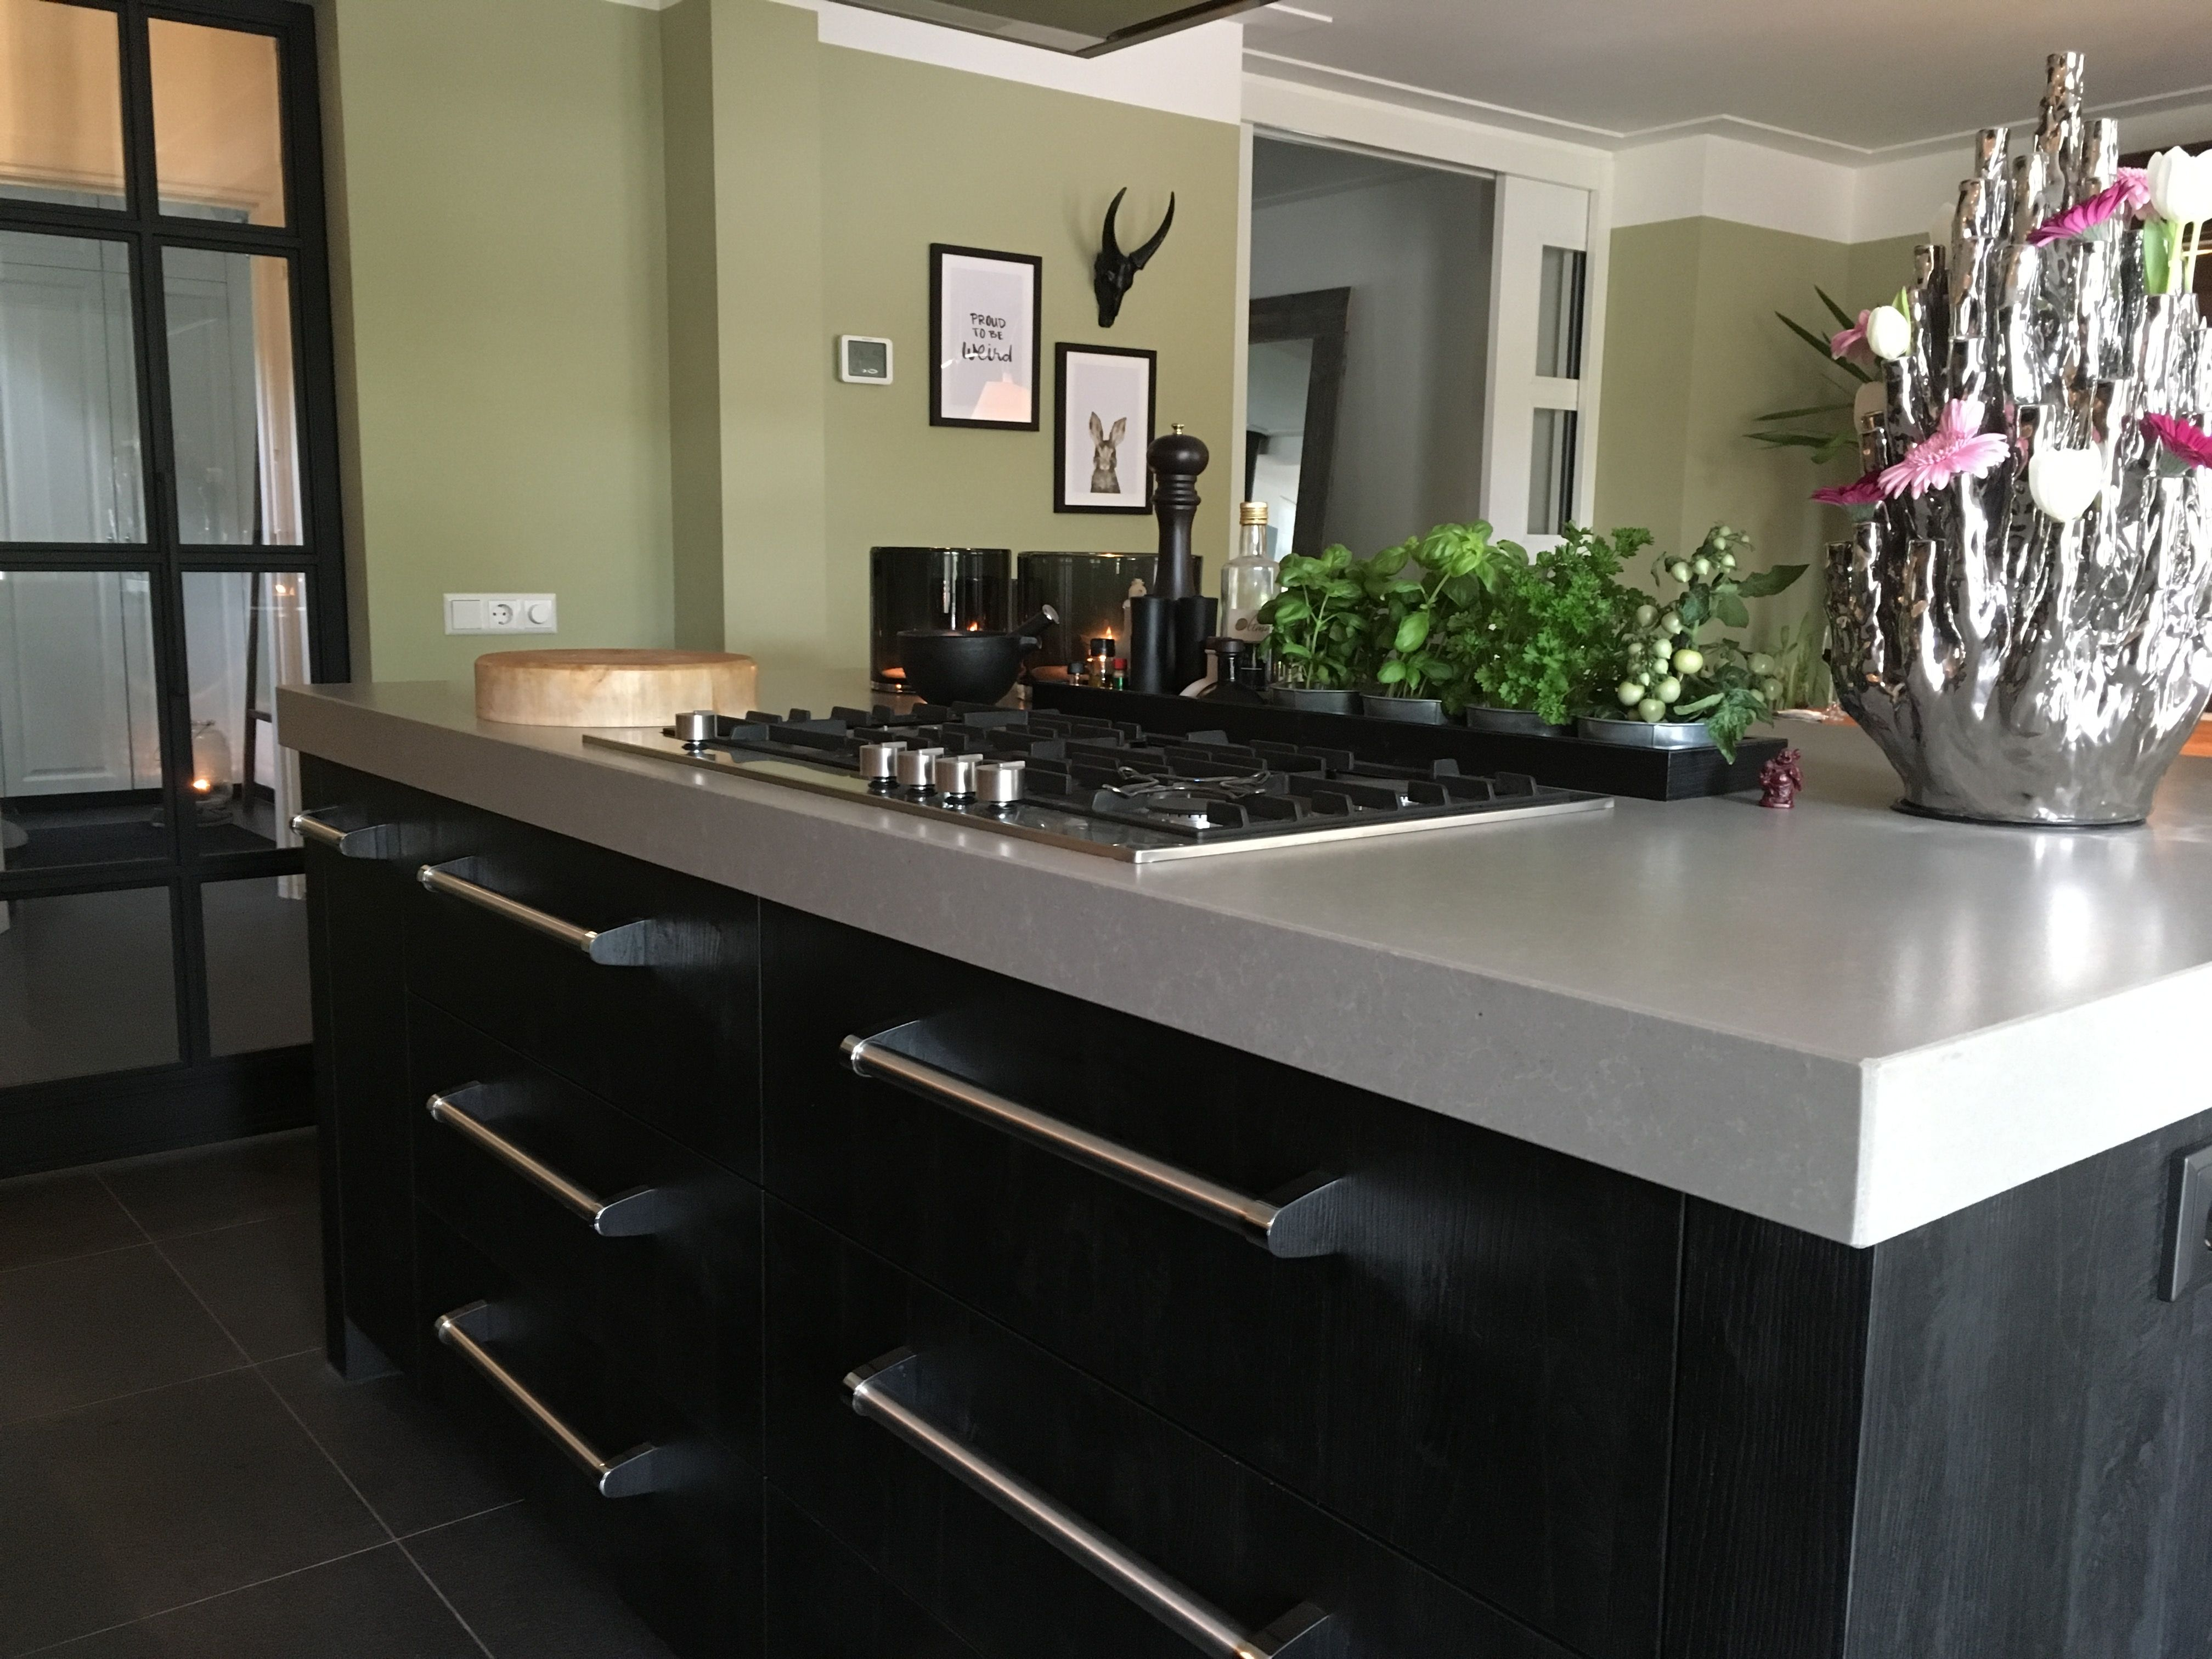 Zwart Keuken Grepen : Keuken zwart composiet blad boretti viking grepen. #home